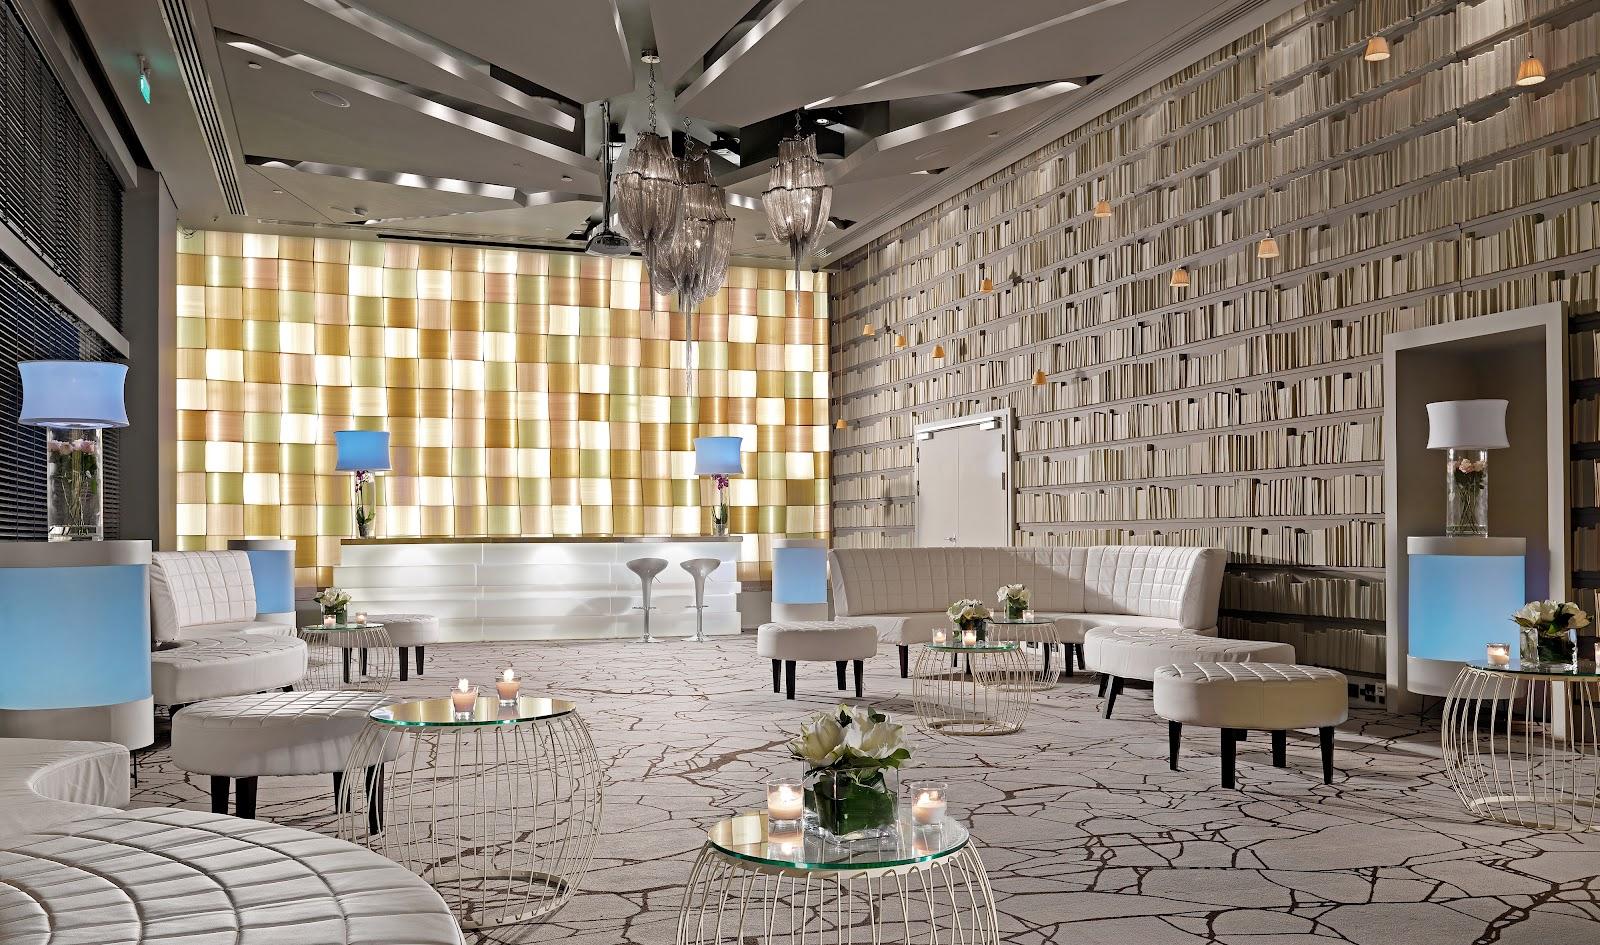 Radisson Blu Park Hotel Conference